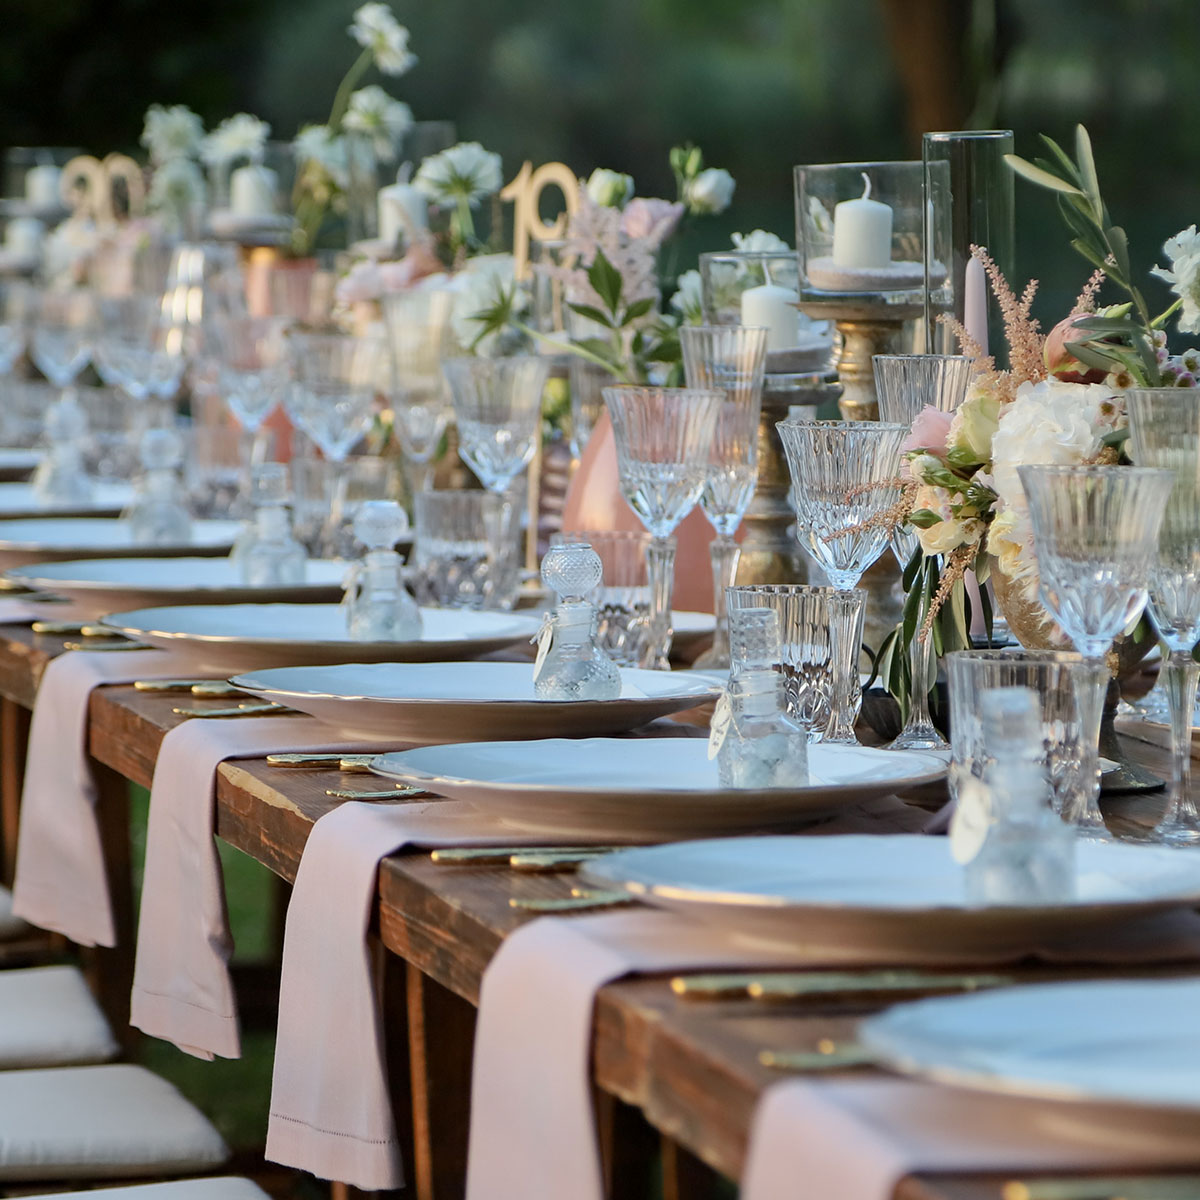 Ricevimenti per matrimoni | Negriricevimenti.com